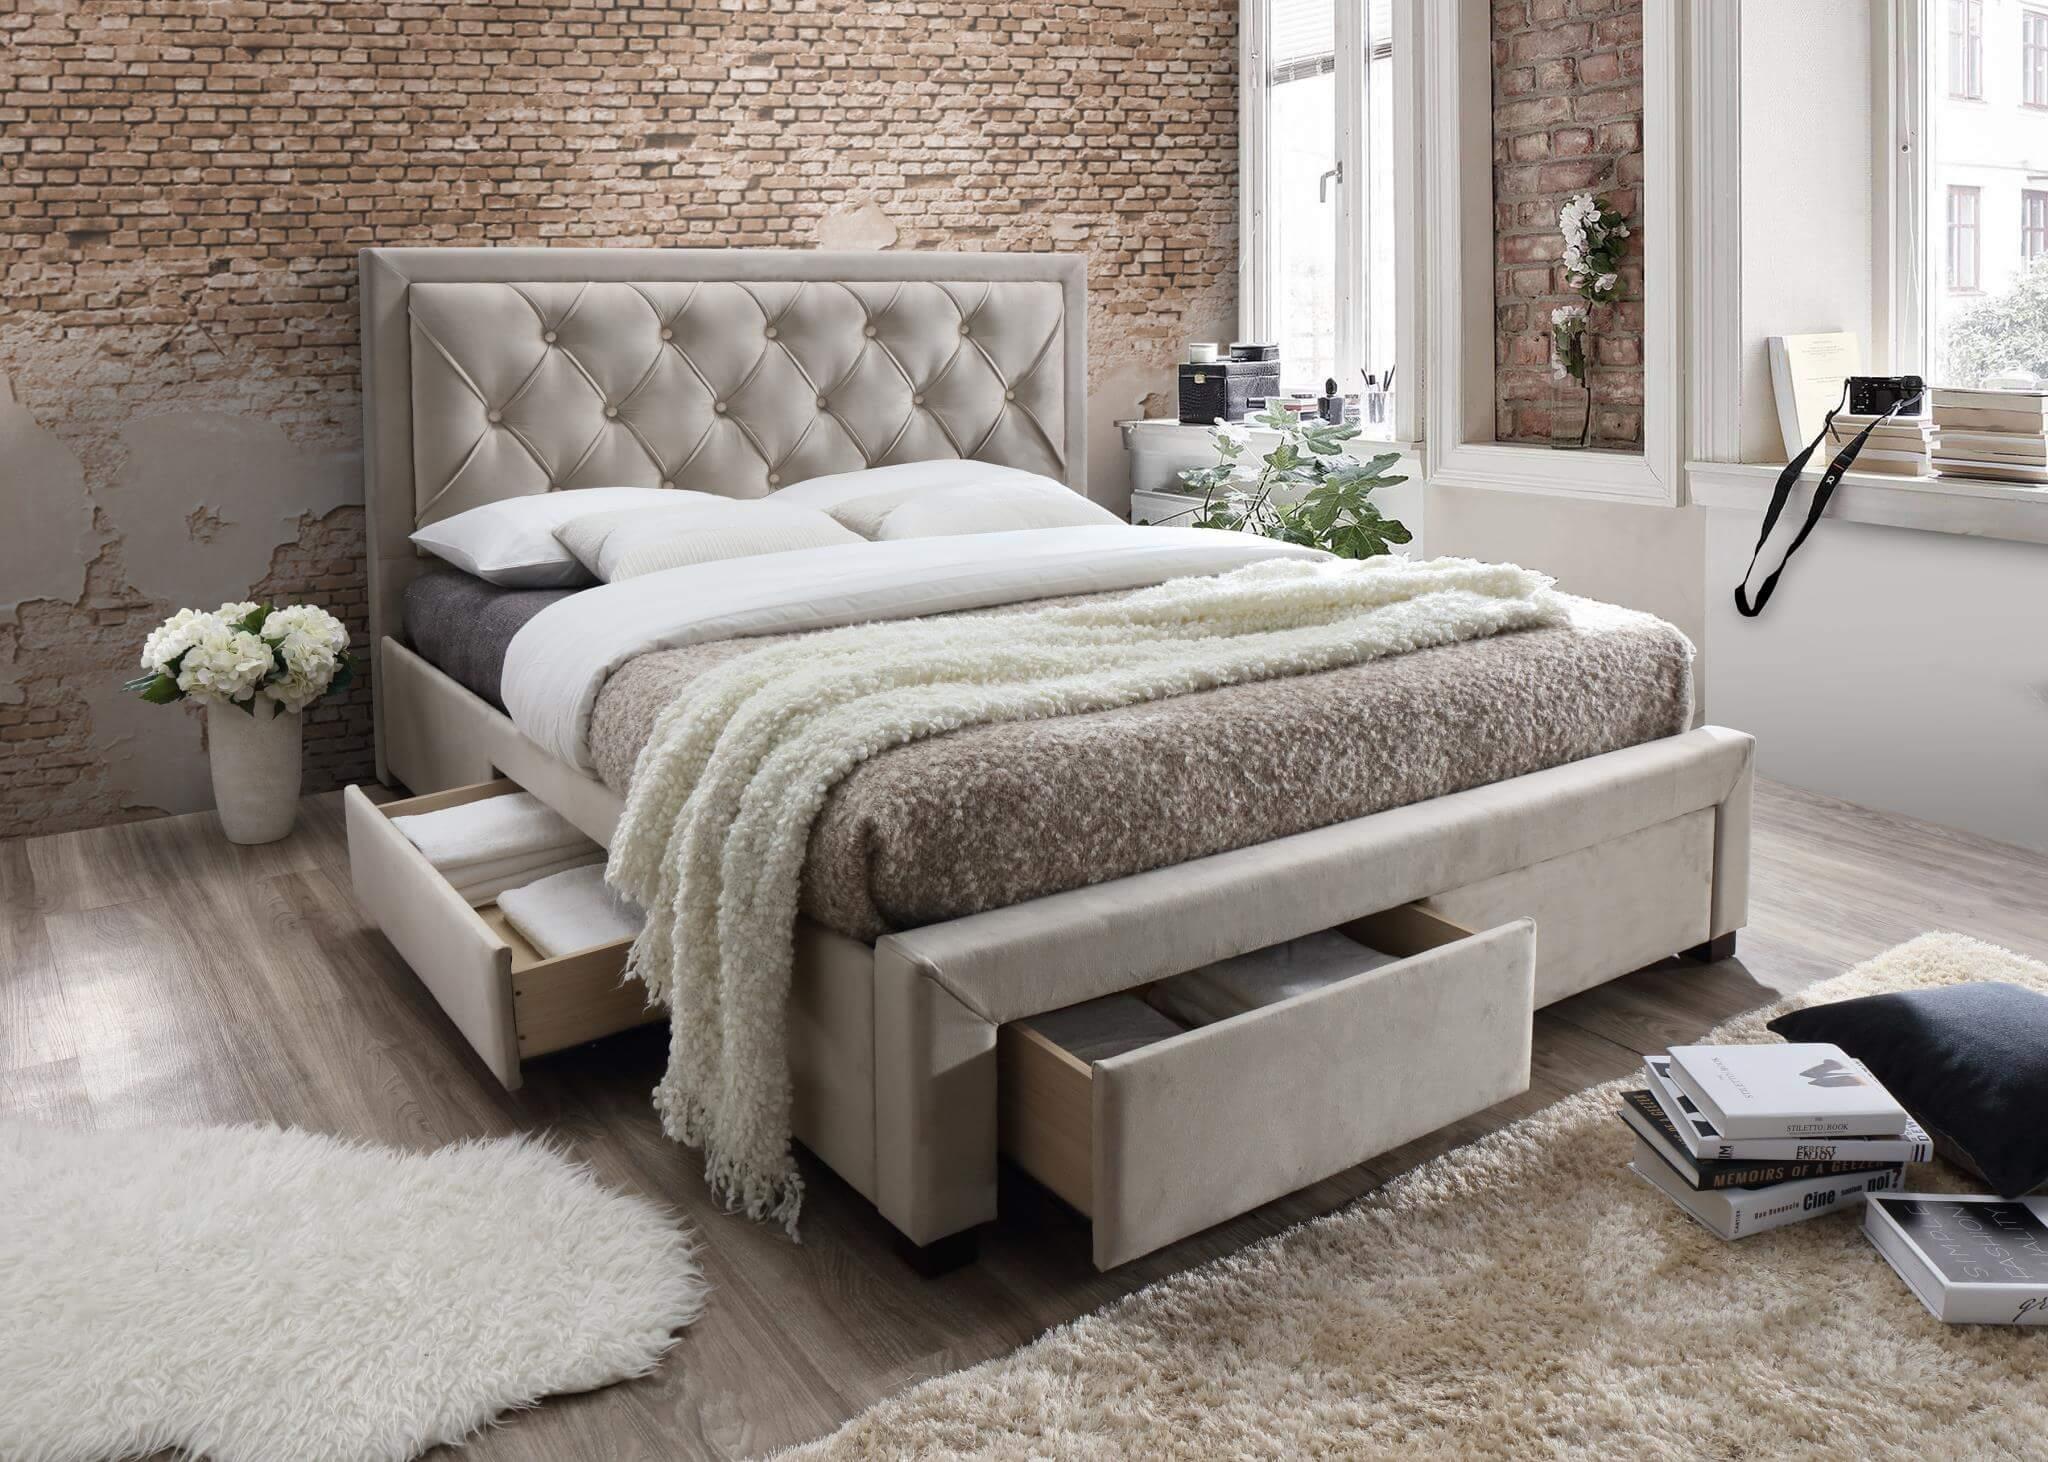 Wes Queen Upholstered Storage Bed Bedroom Furniture